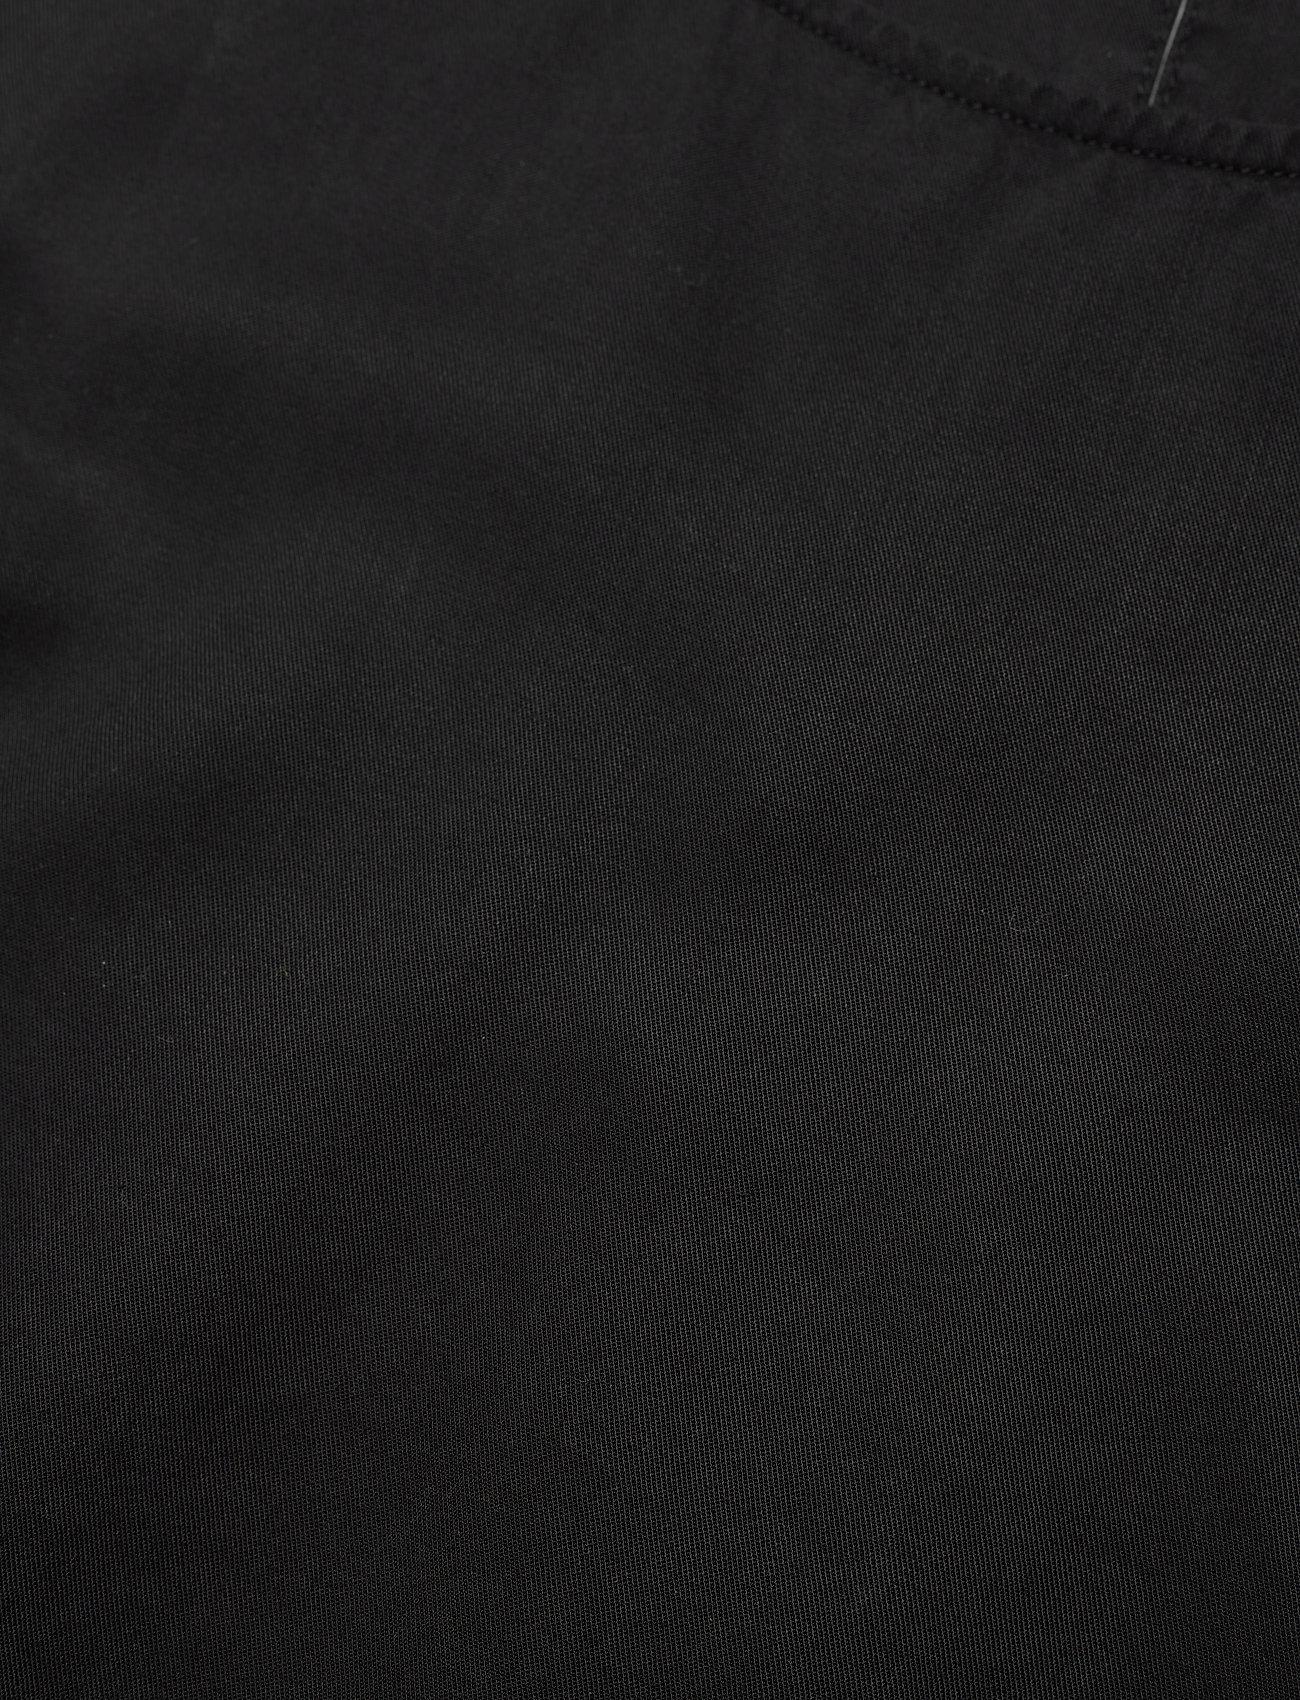 Marc O'Polo - SHIRTS/BLOUSES SLEEVELESS - Ærmeløse bluser - black - 2